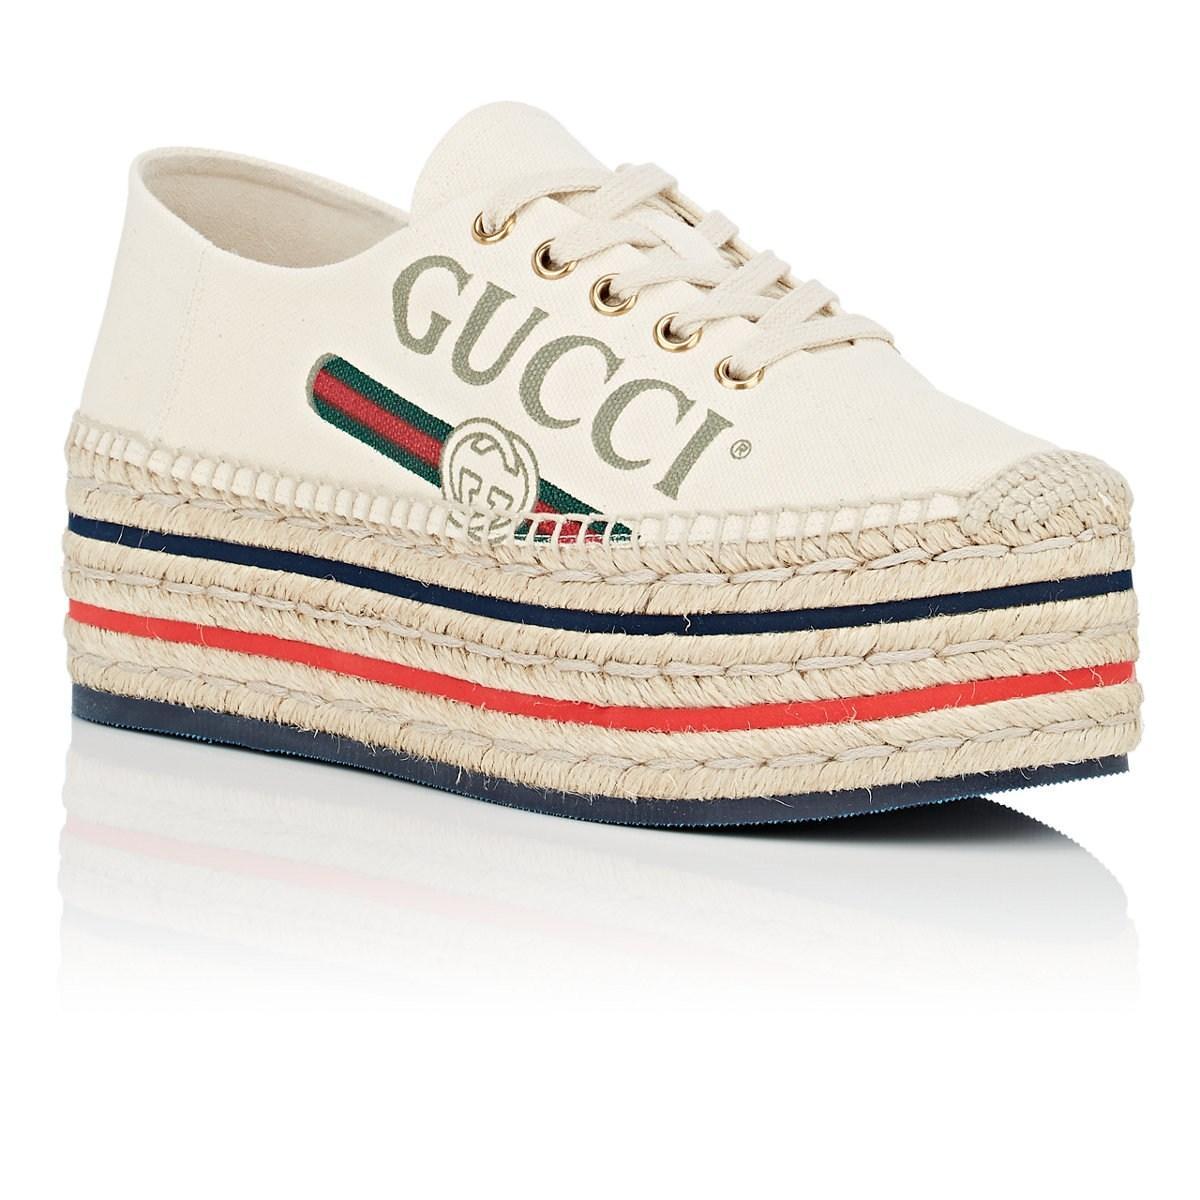 b40d520b9fb Gucci - White Canvas Platform Espadrille Sneakers - Lyst. View fullscreen